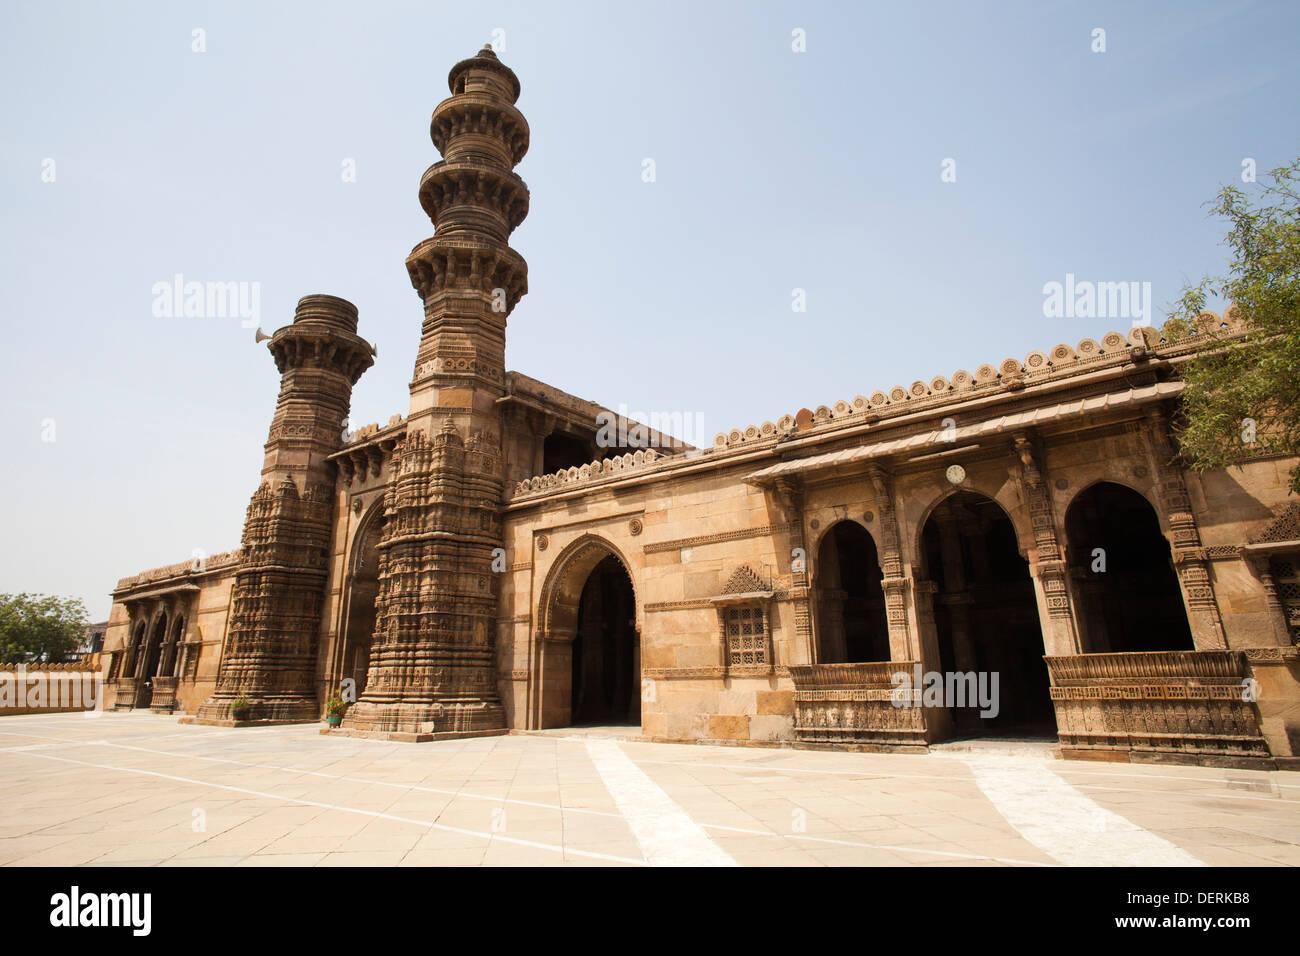 Facade of a mosque, Jhulta Minara, Ahmedabad, Gujarat, India - Stock Image